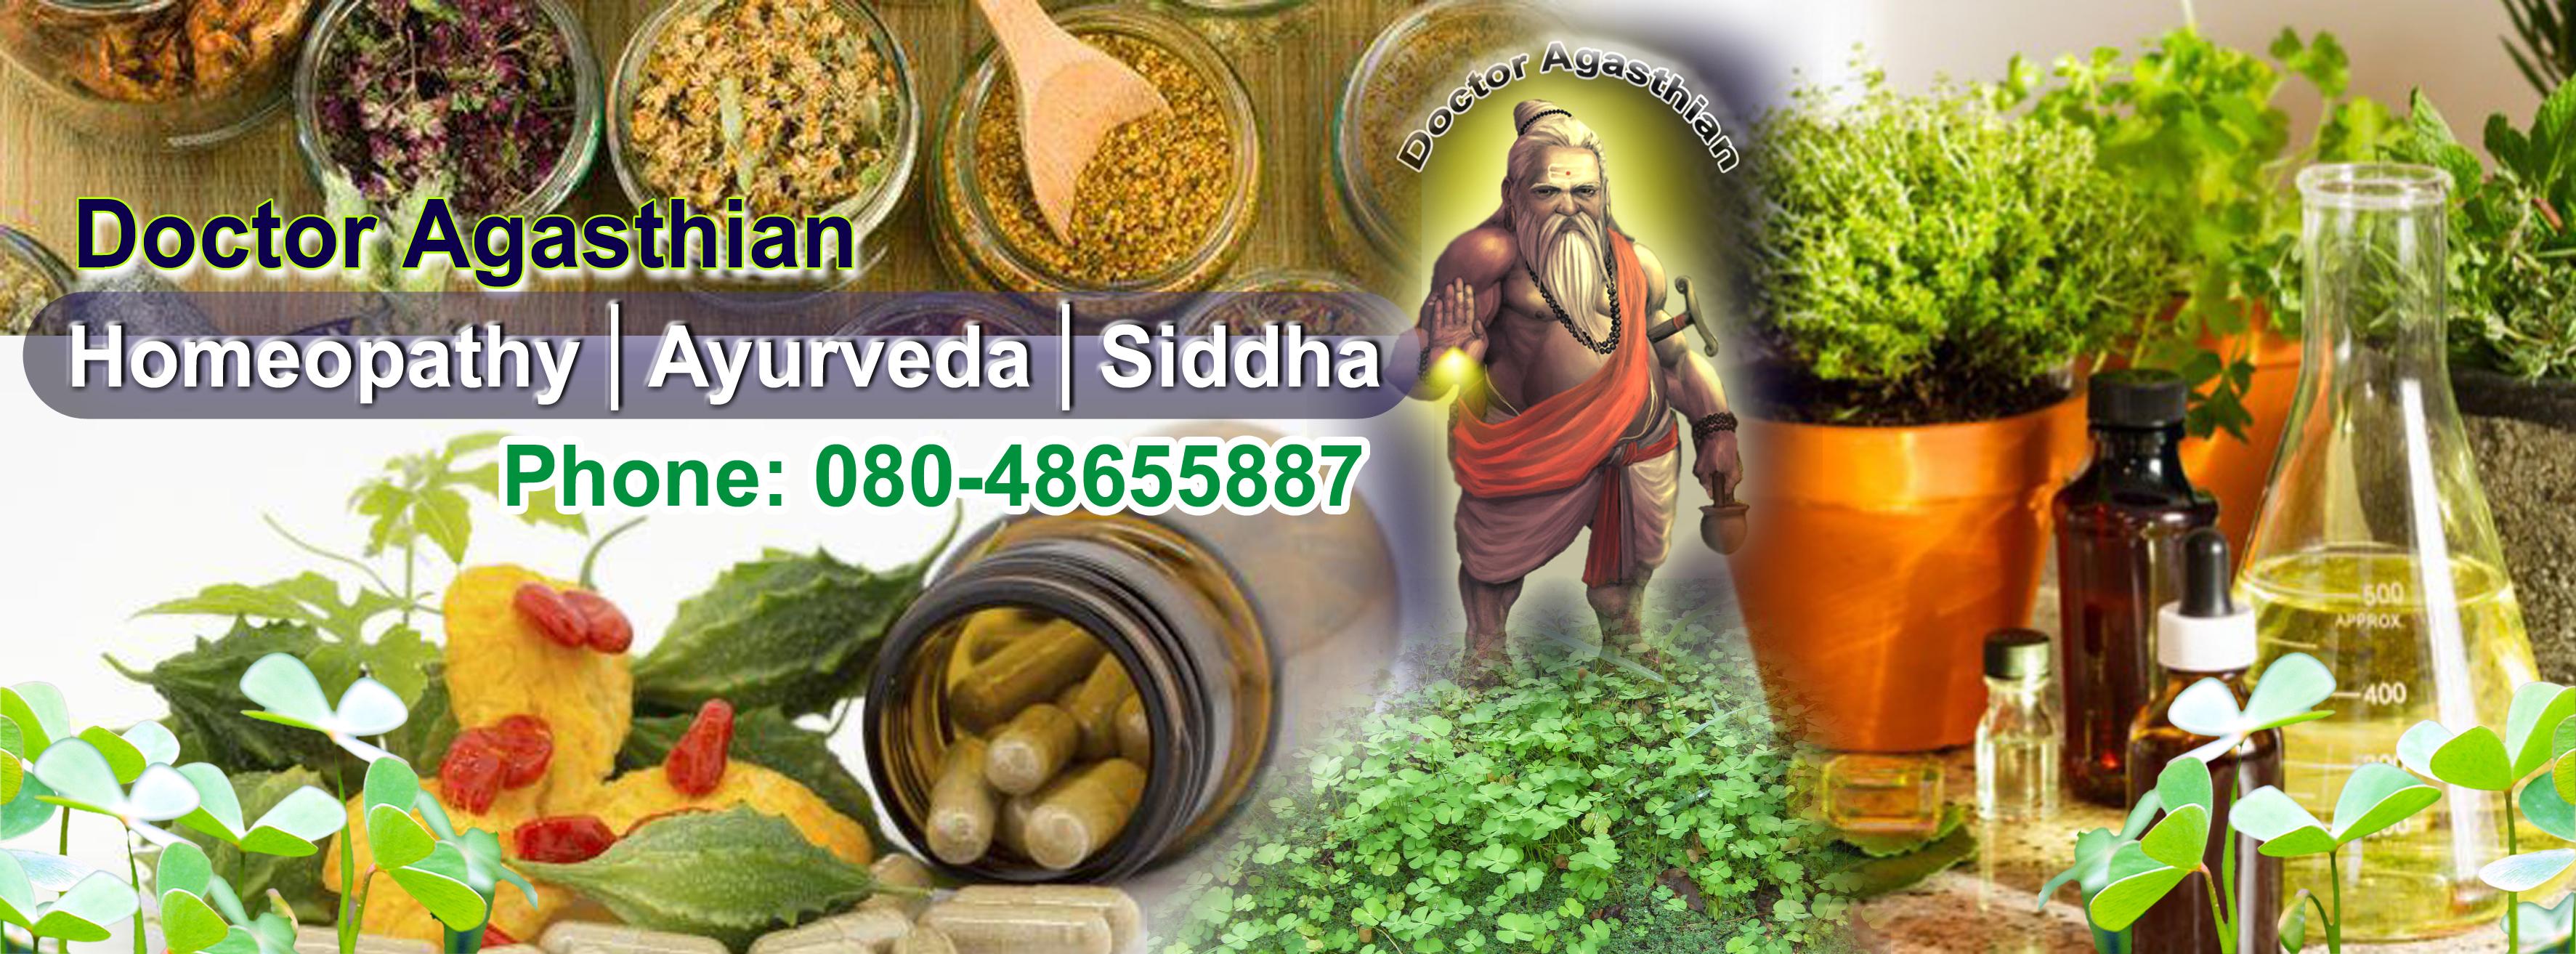 Dr.Agasthian Alternative Medication, Bangalore